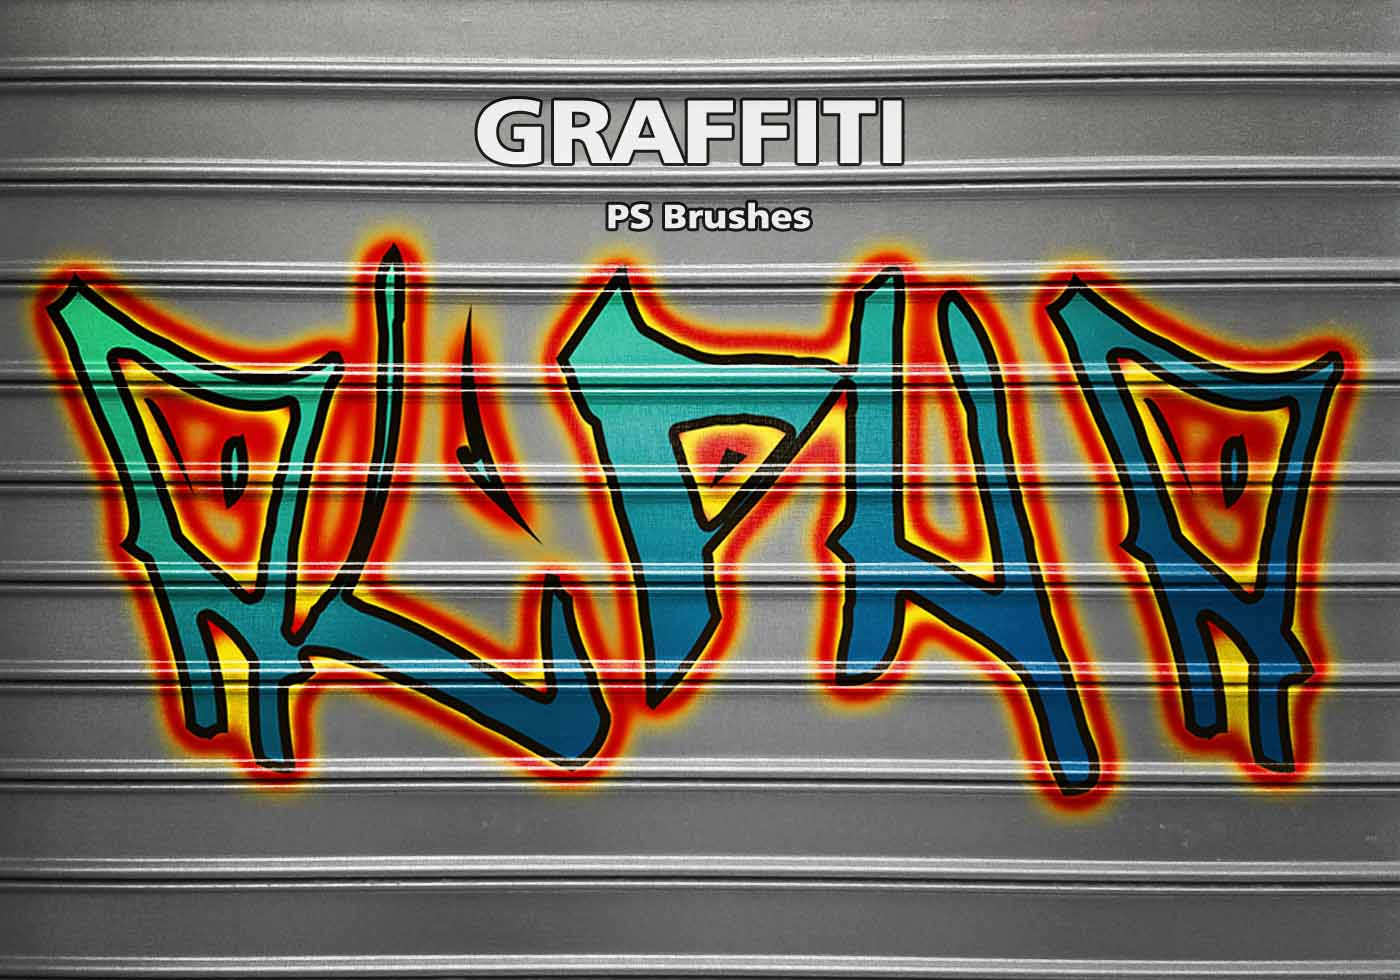 26 Graffiti Alpha Set Ps Brushes Abr Vol 18 Free Photoshop Brushes At Brusheezy